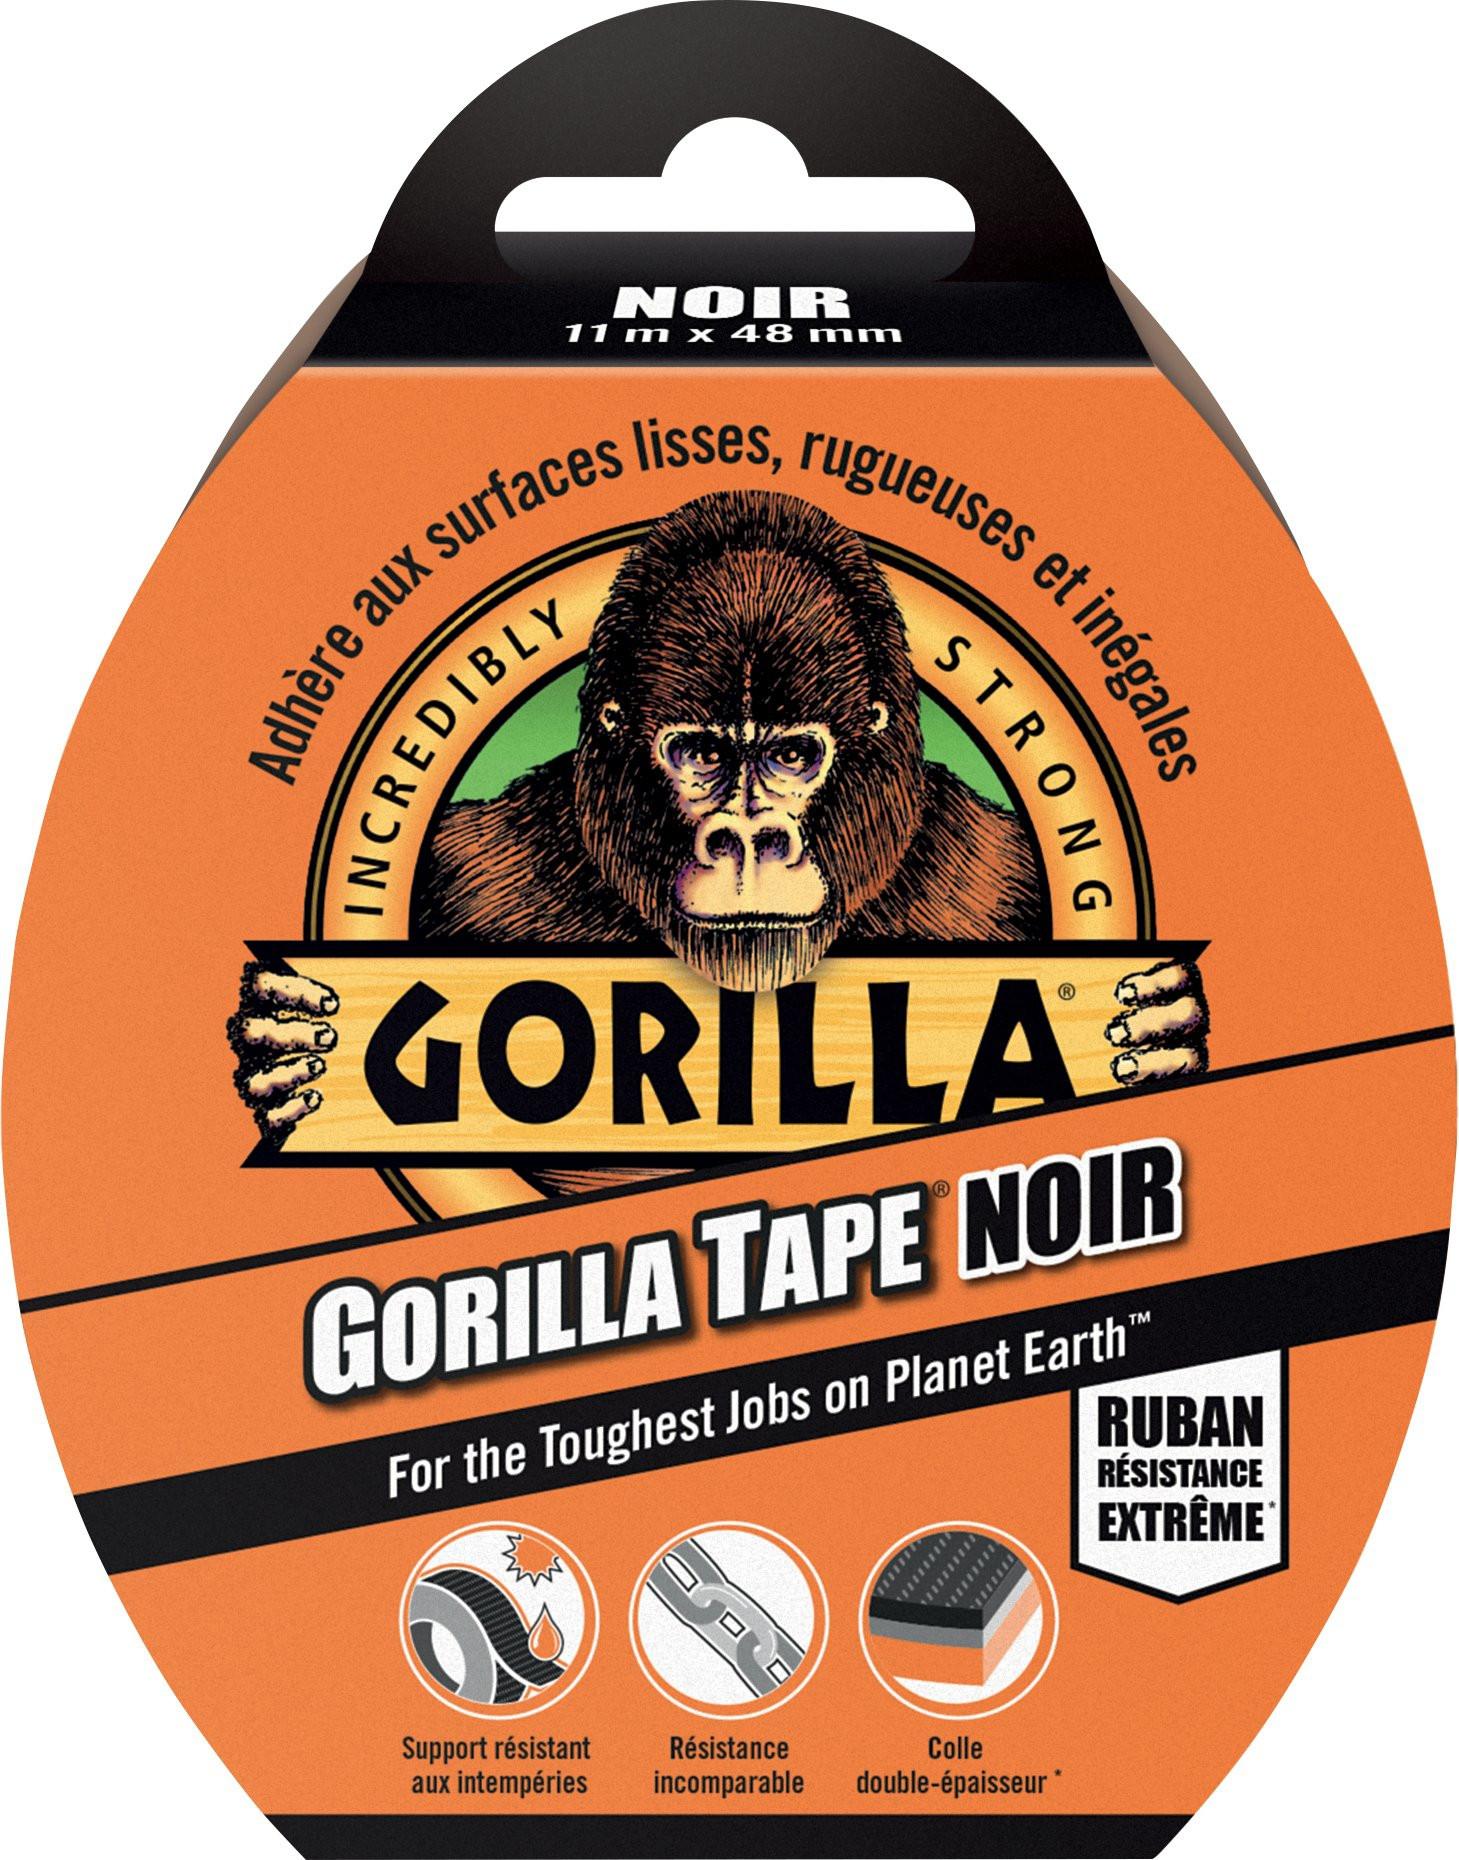 Gorilla Tape Black 11m x 48 mm